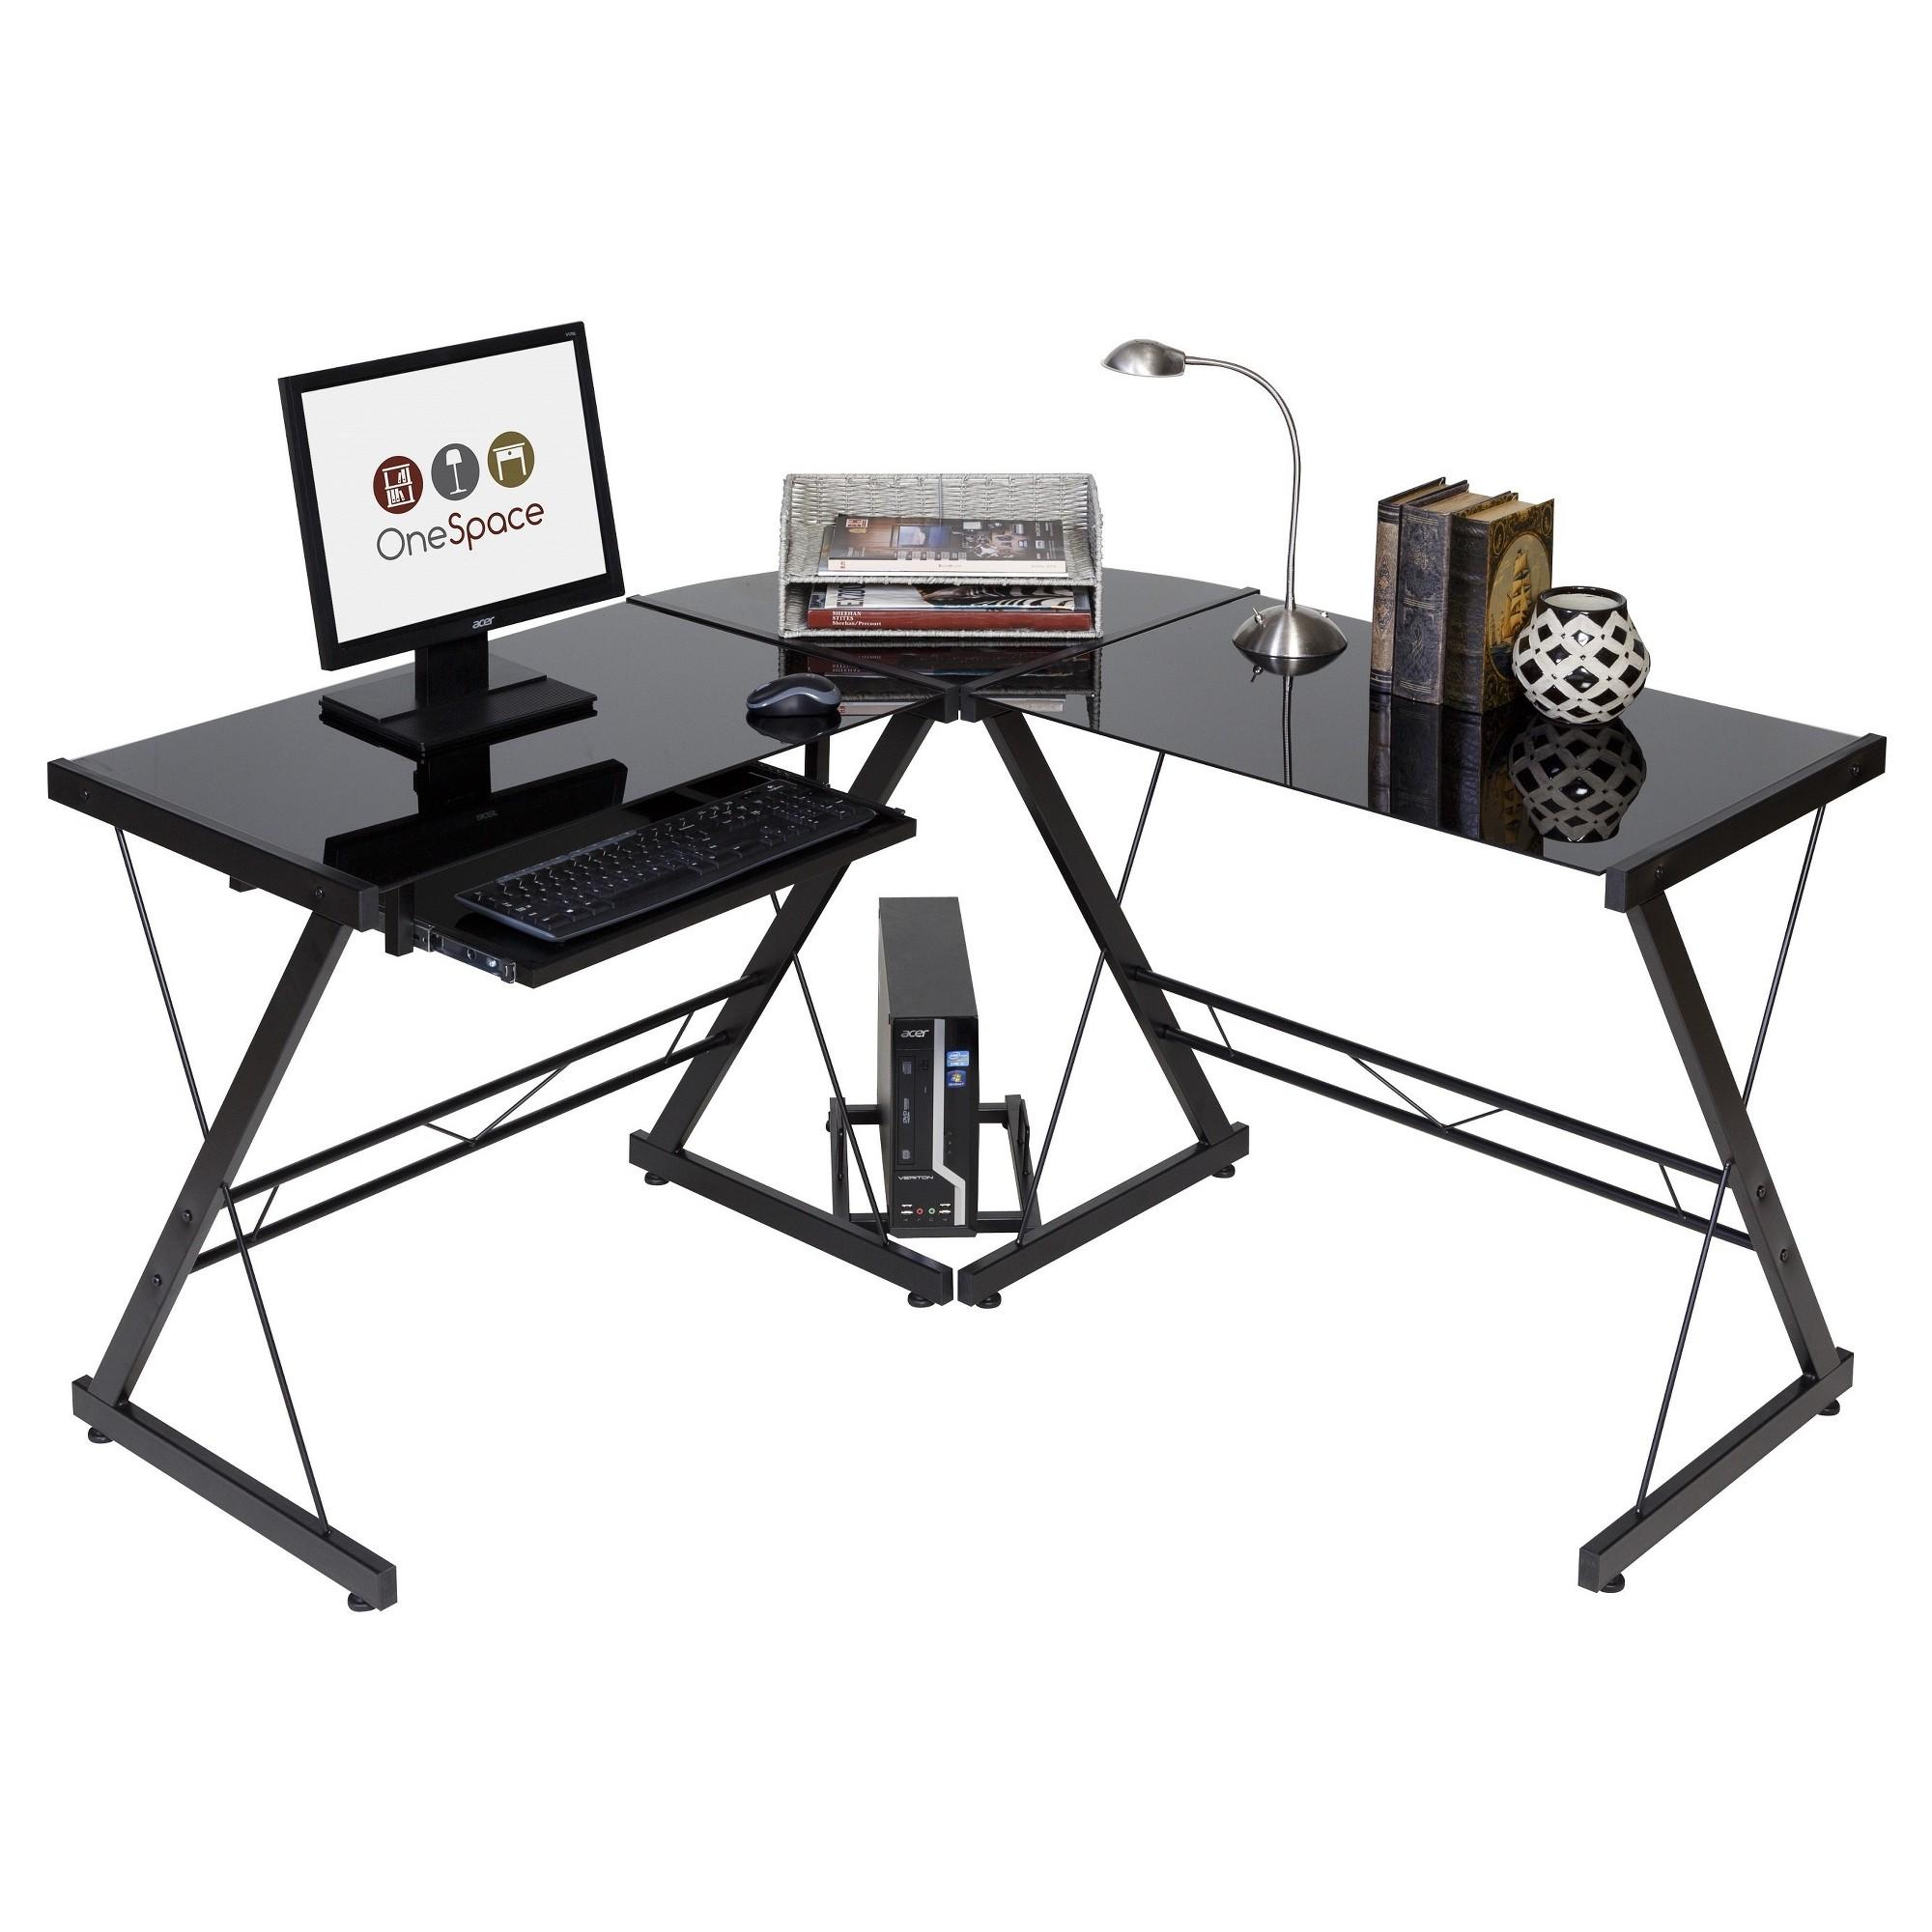 Glass L Shaped Computer Desk With Keyboard Tray Black Black Onespace In 2020 L Shaped Desk Desk Custom Computer Desk